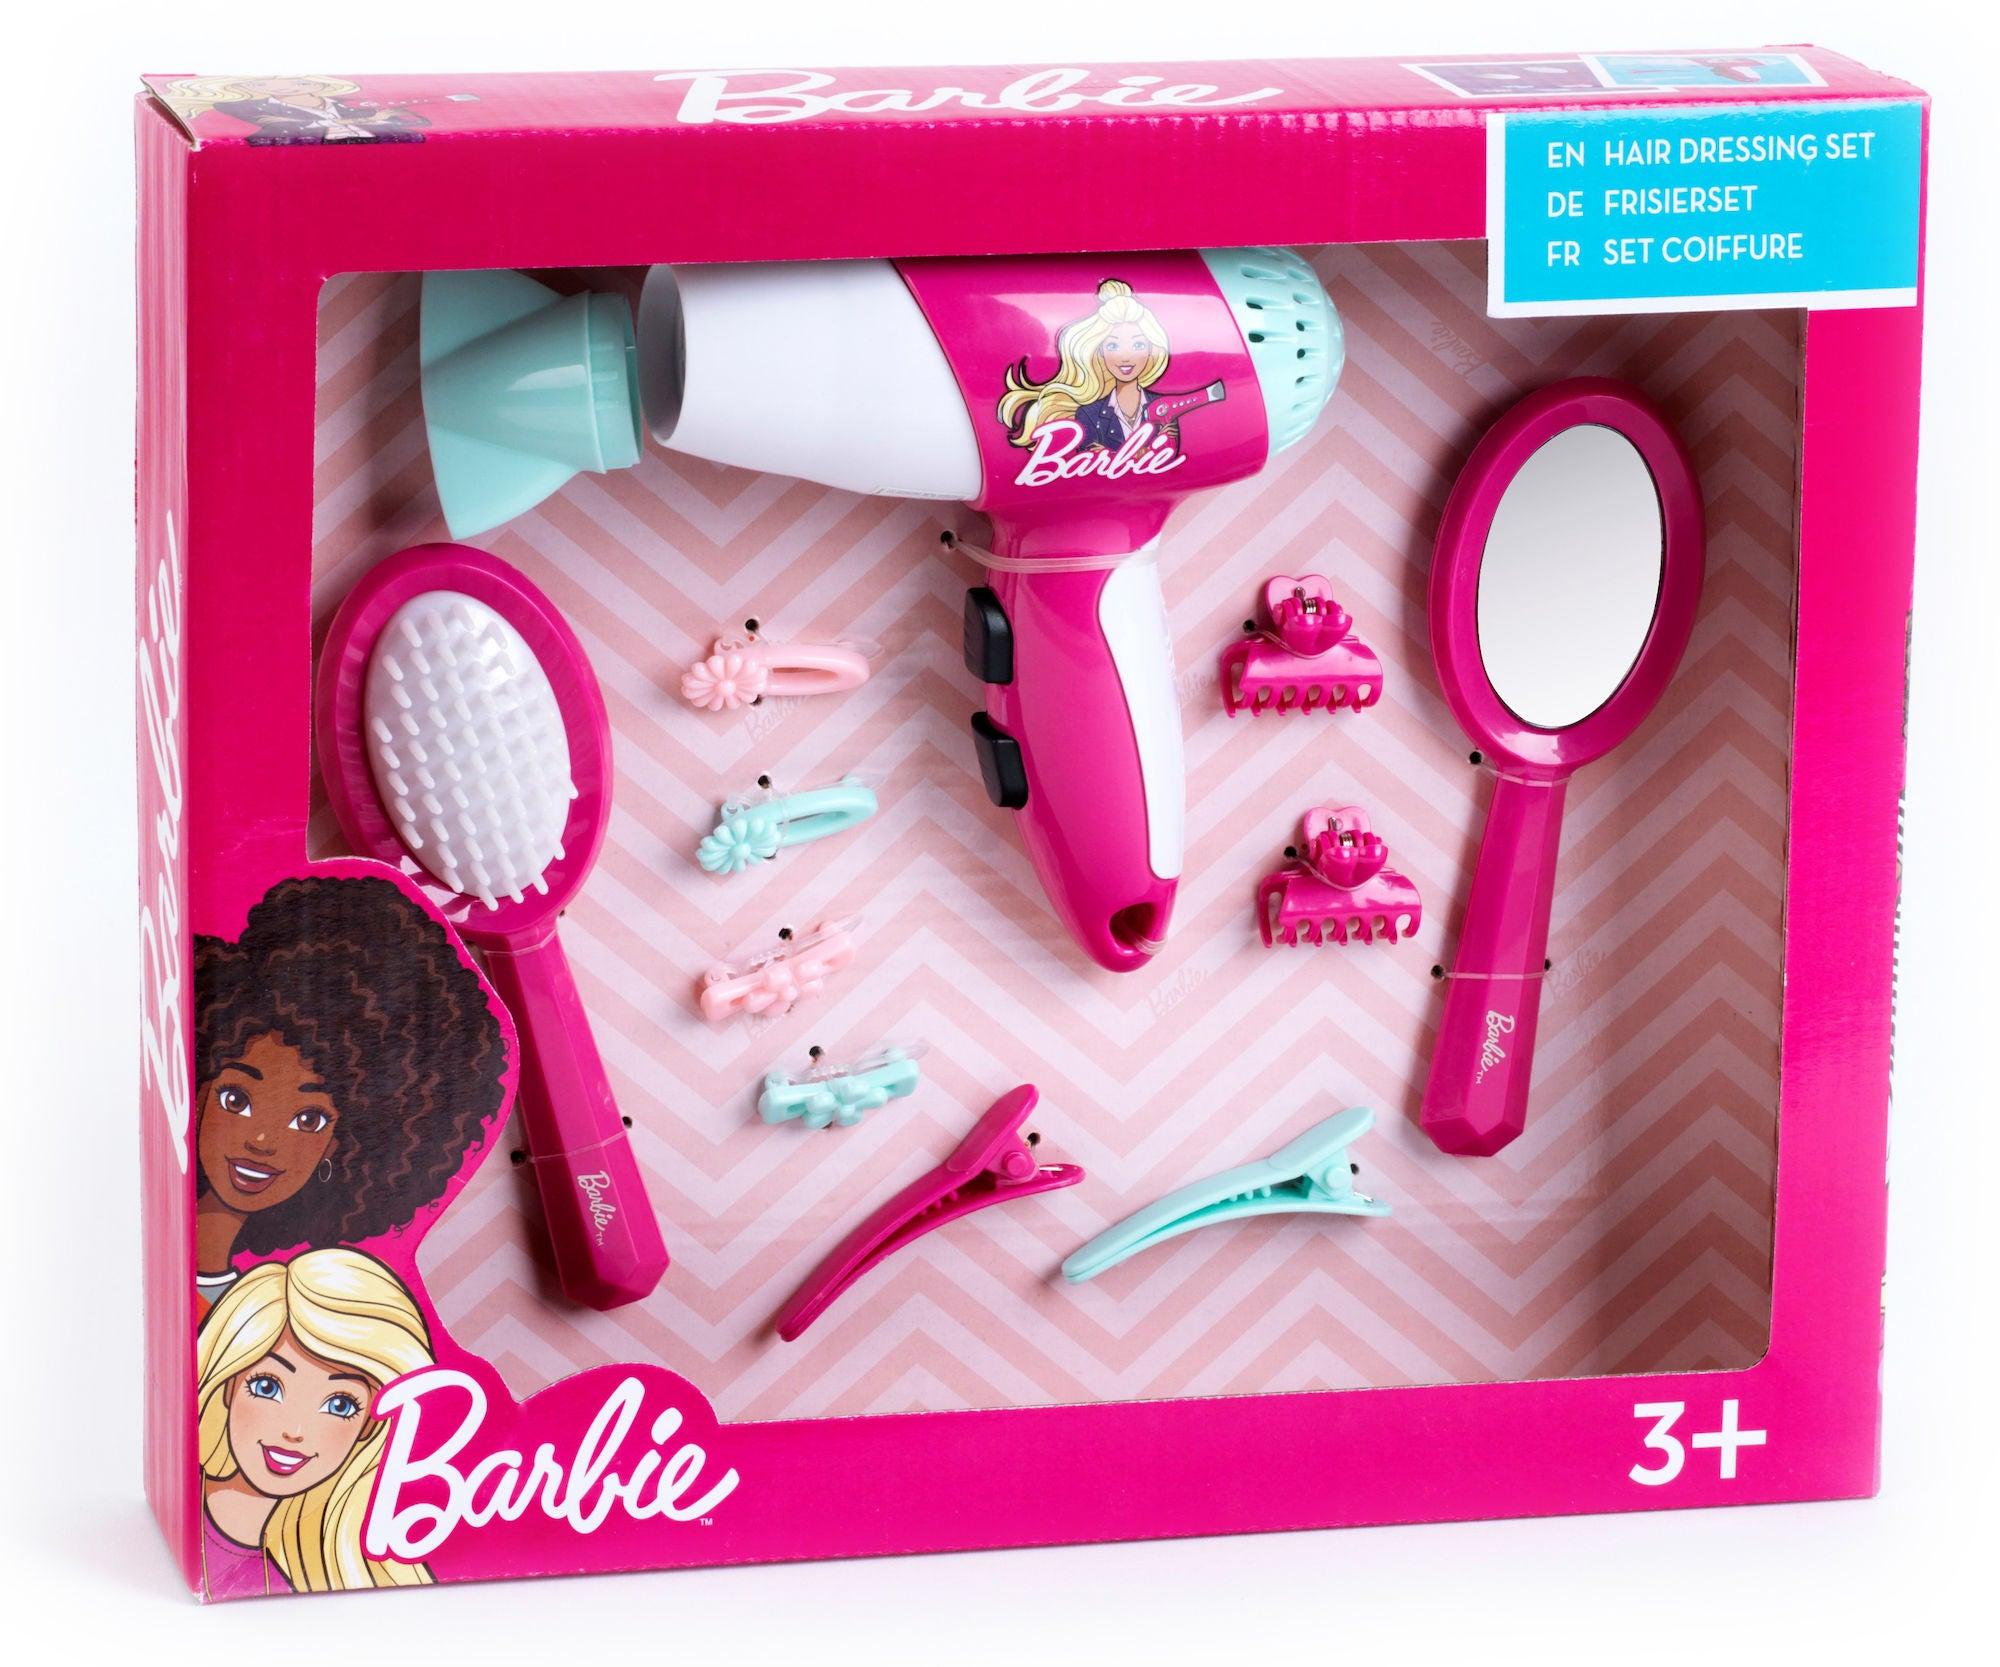 Barbie Kampaamosetti & Hiustenkuivain